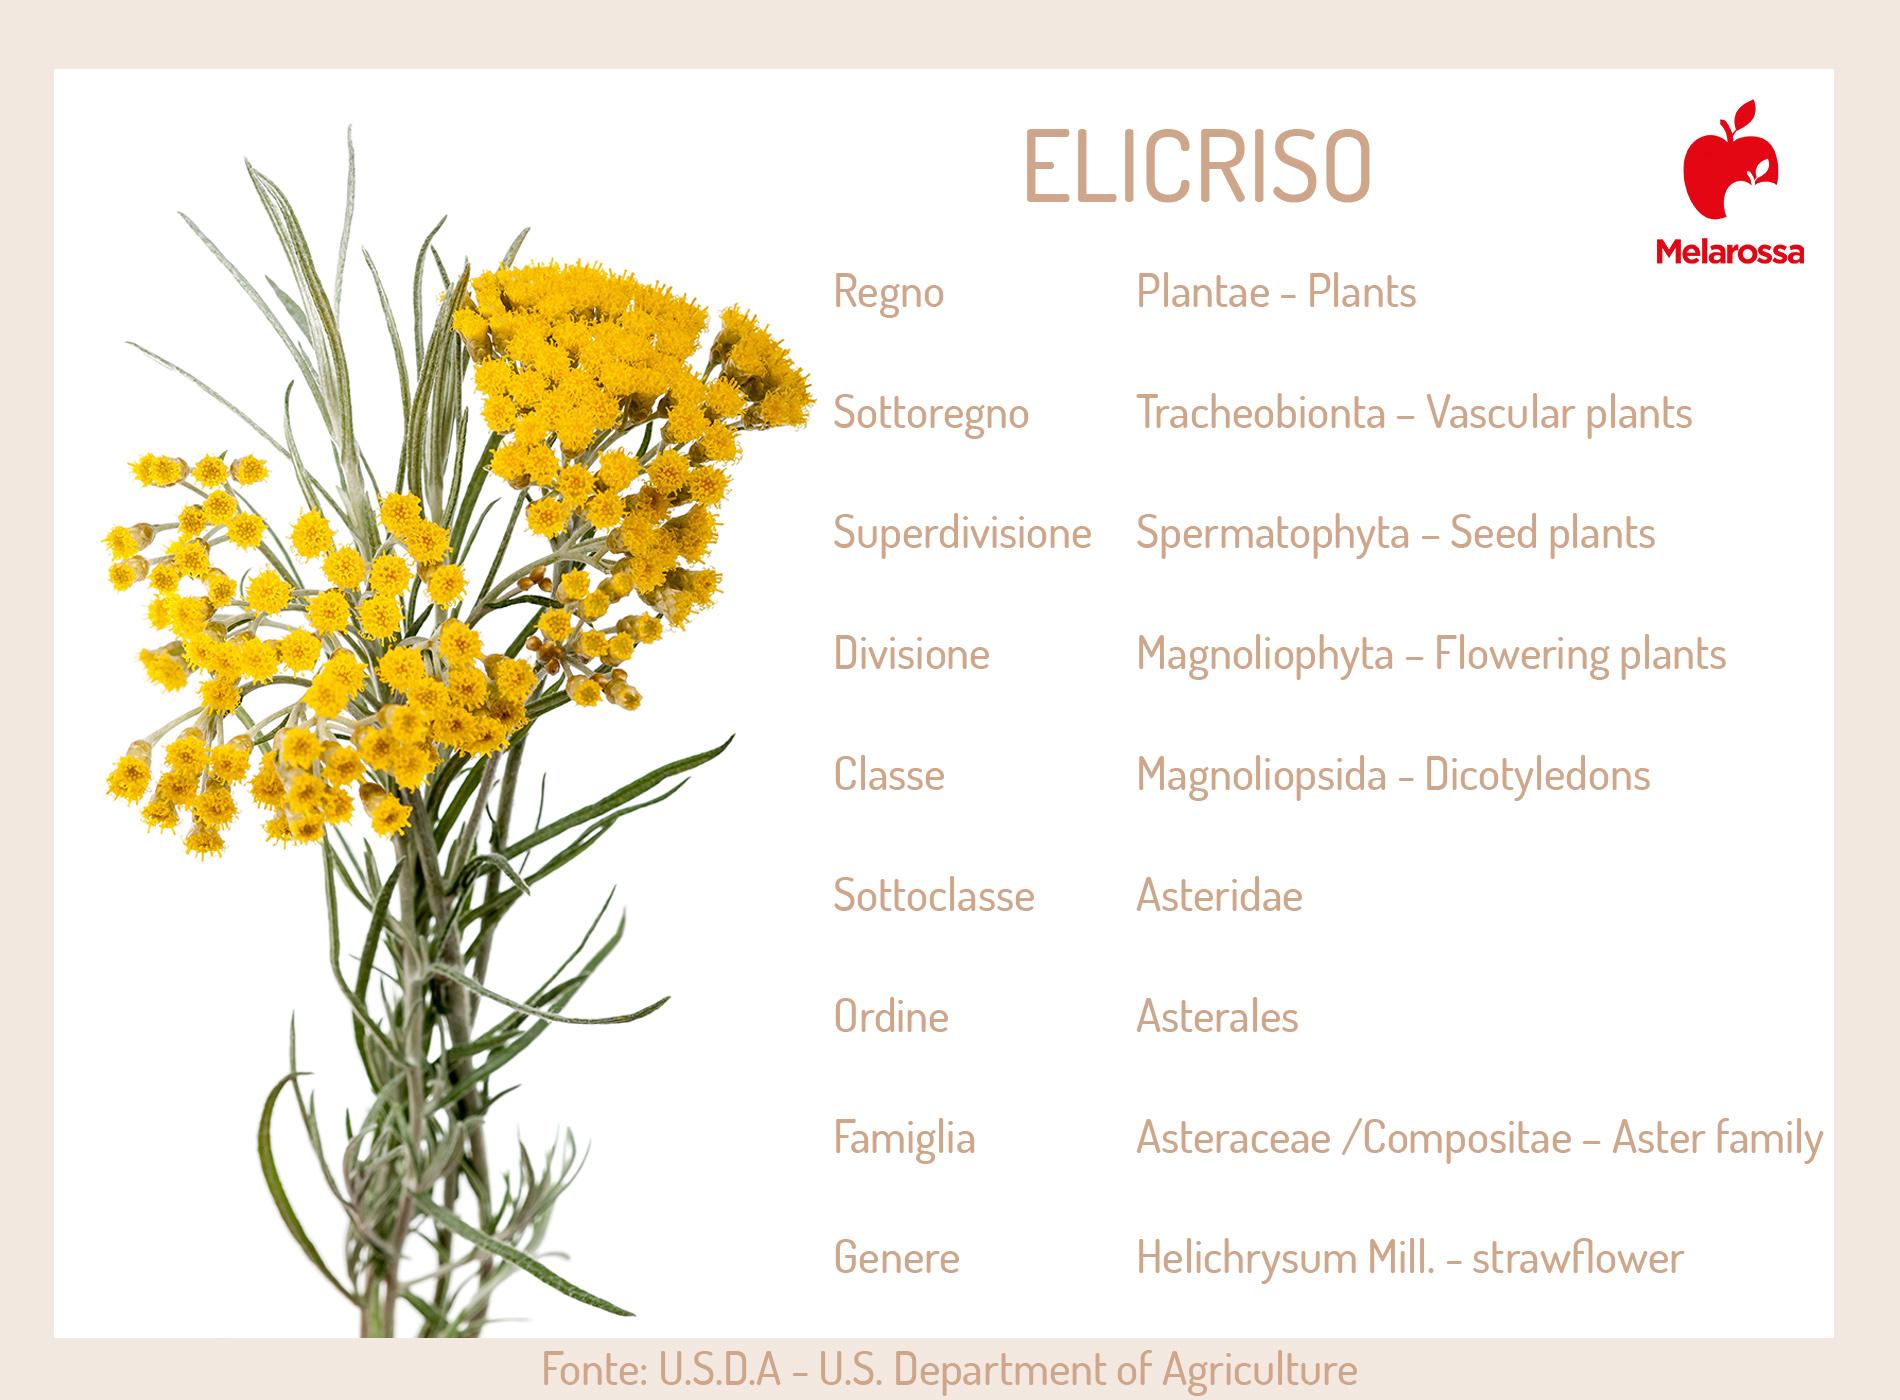 elicriso: pianta e botanica